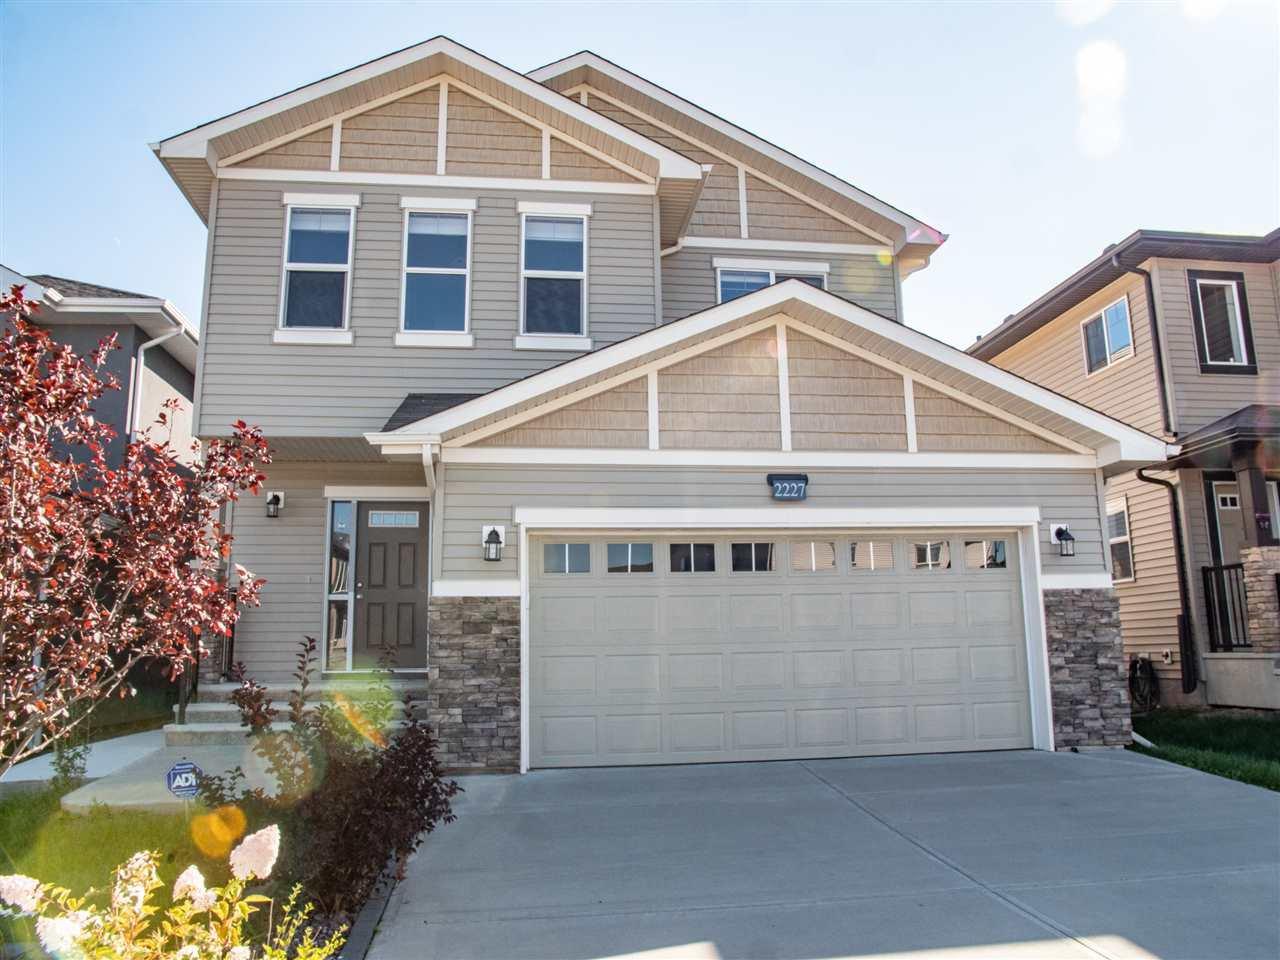 Main Photo: 2227 21 Avenue in Edmonton: Zone 30 House for sale : MLS®# E4171748